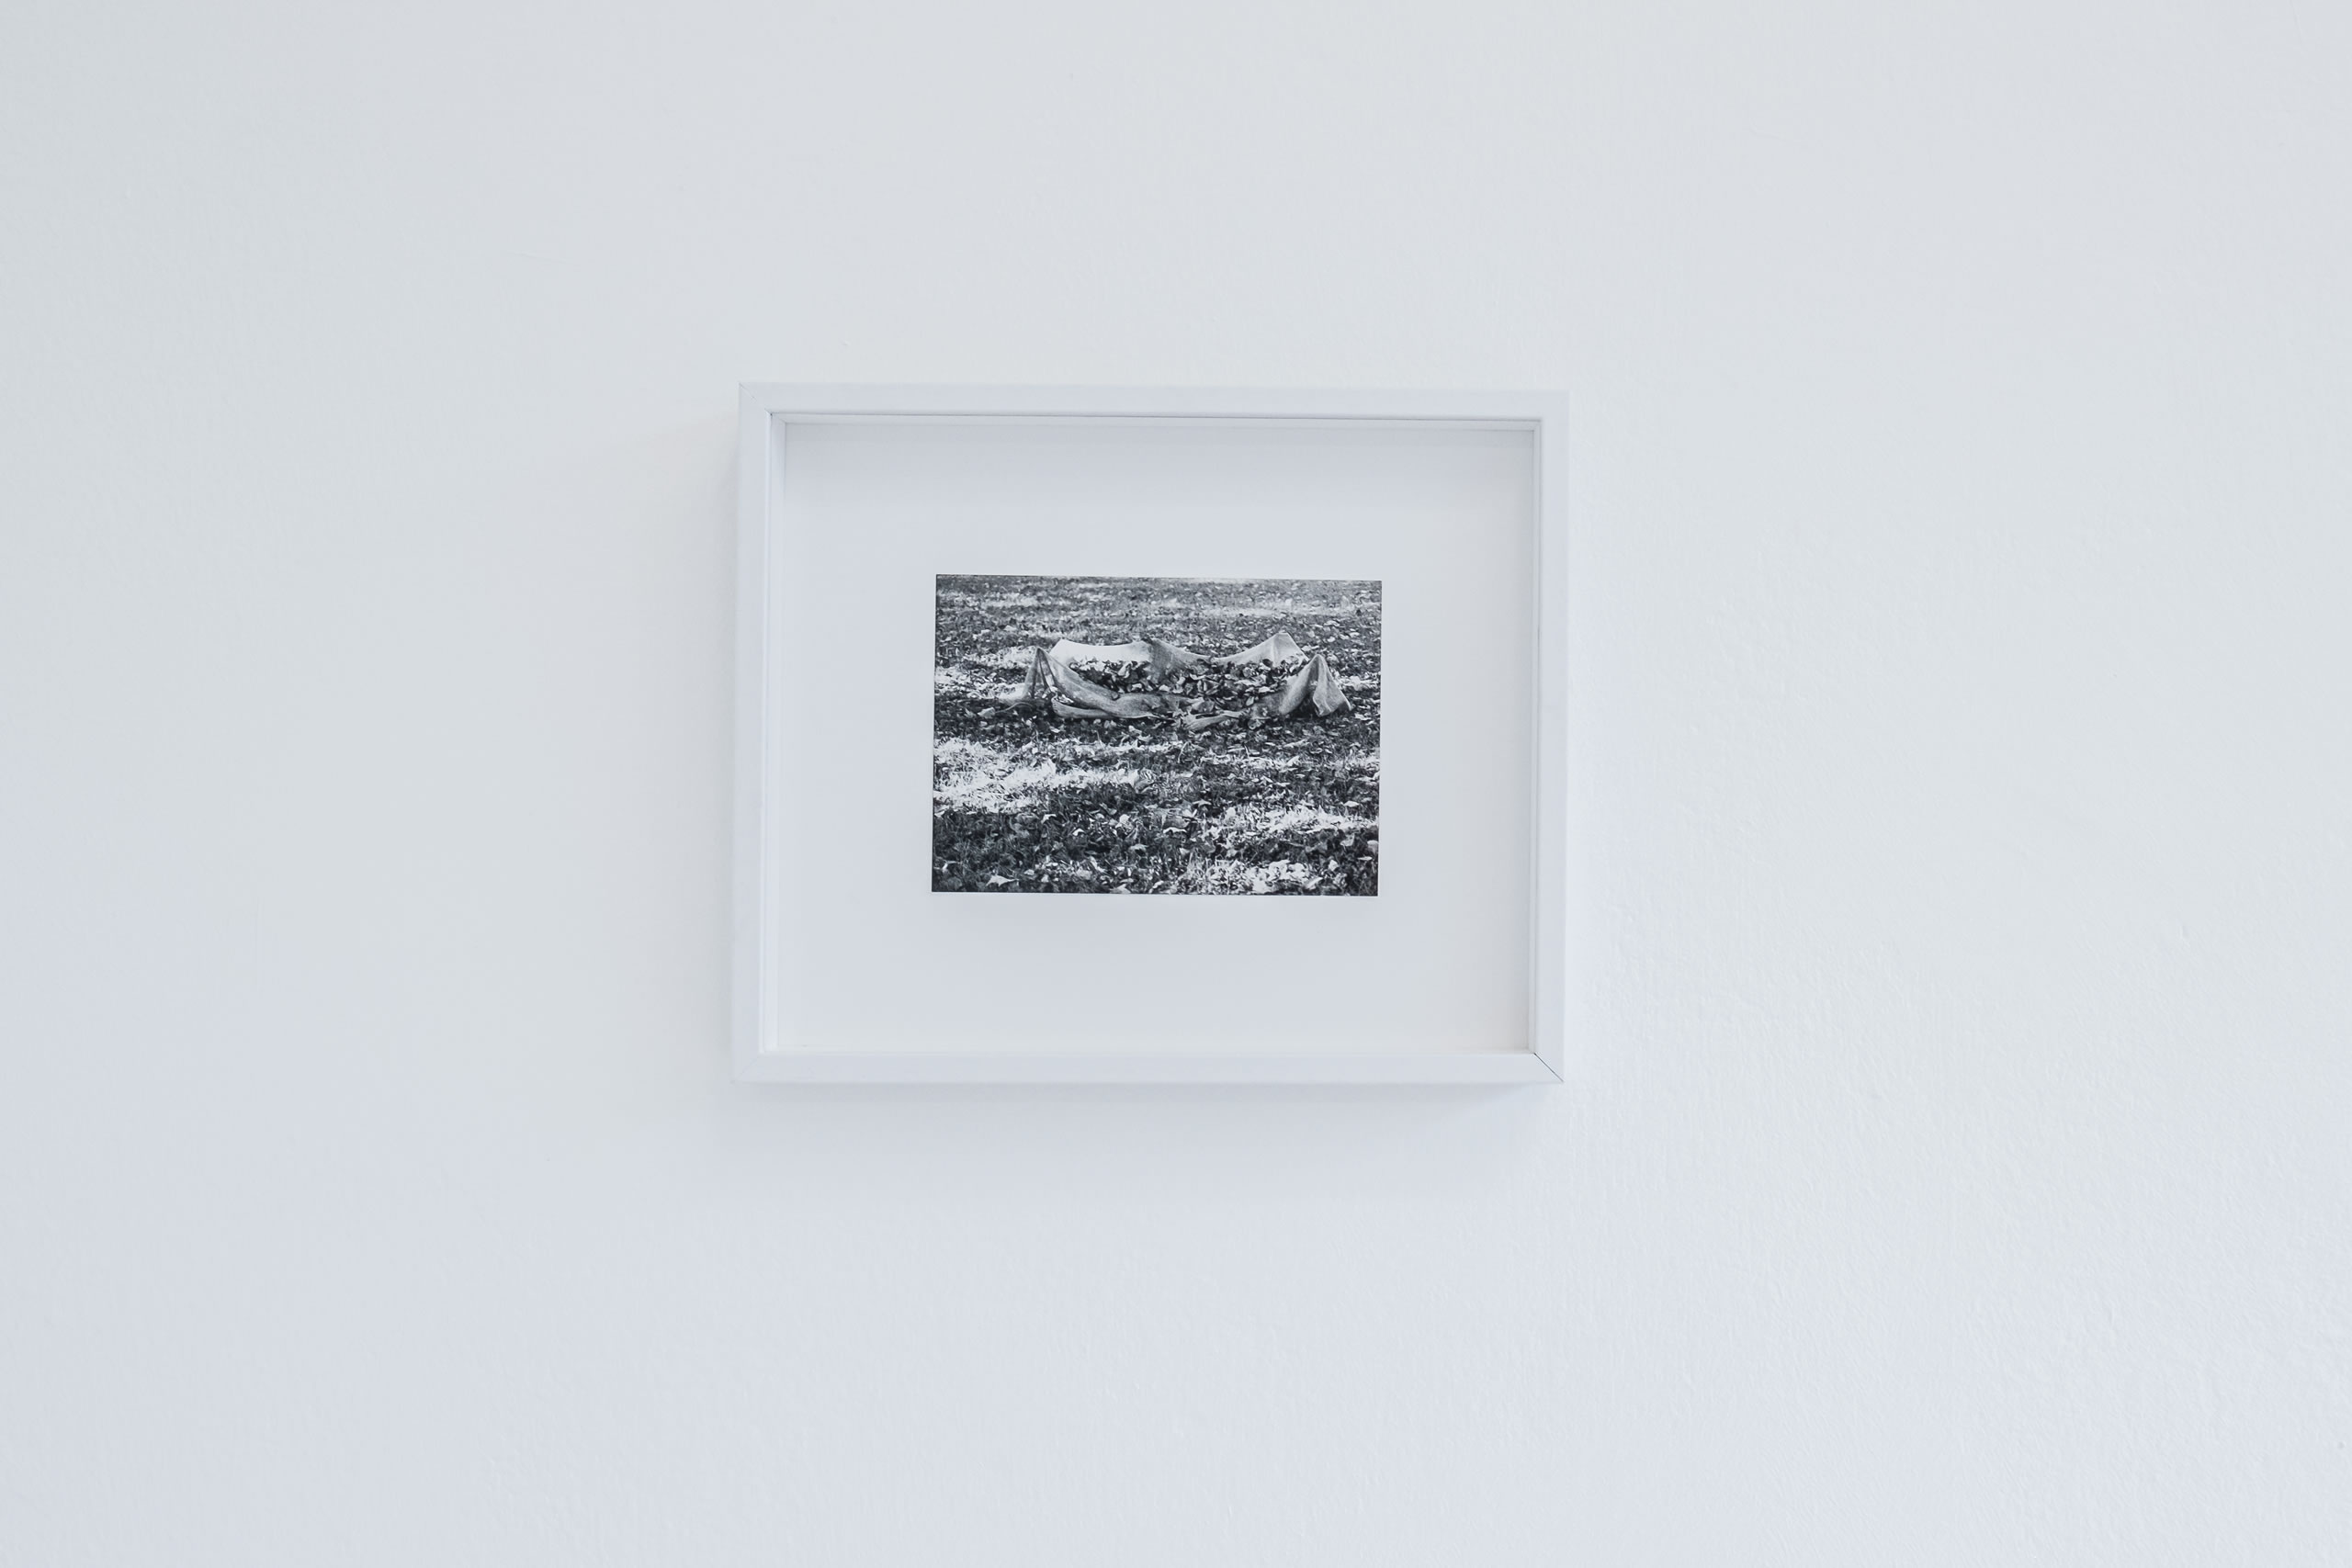 3. Törn | Margot Pilz | Foto Manu Lasnik | 2019 | Galerie3